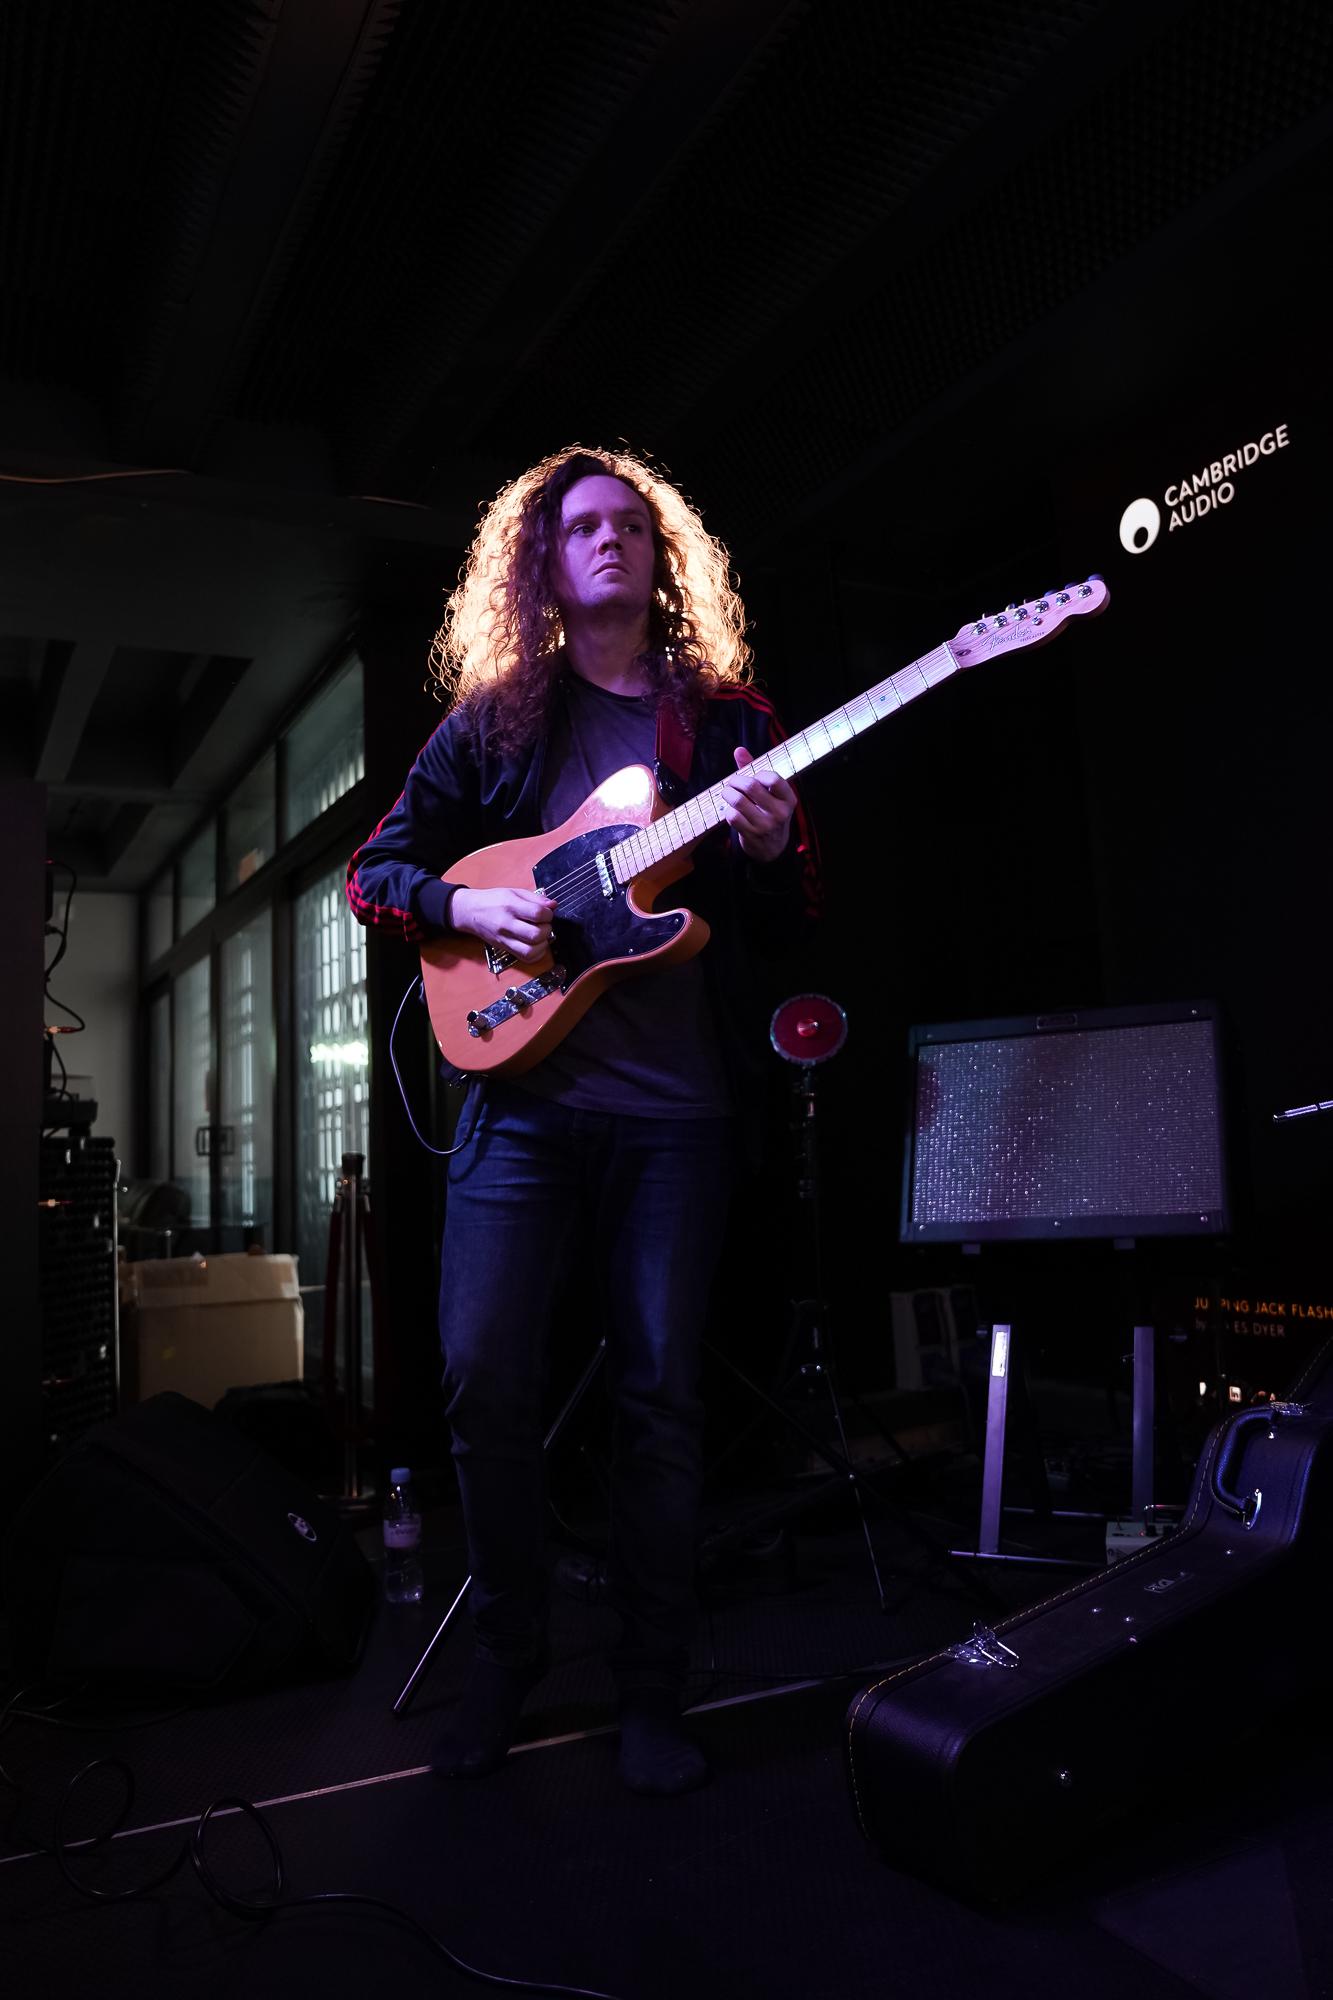 Bridges-band-live-session-20170101-0032-Hanny-Foxhall.jpg